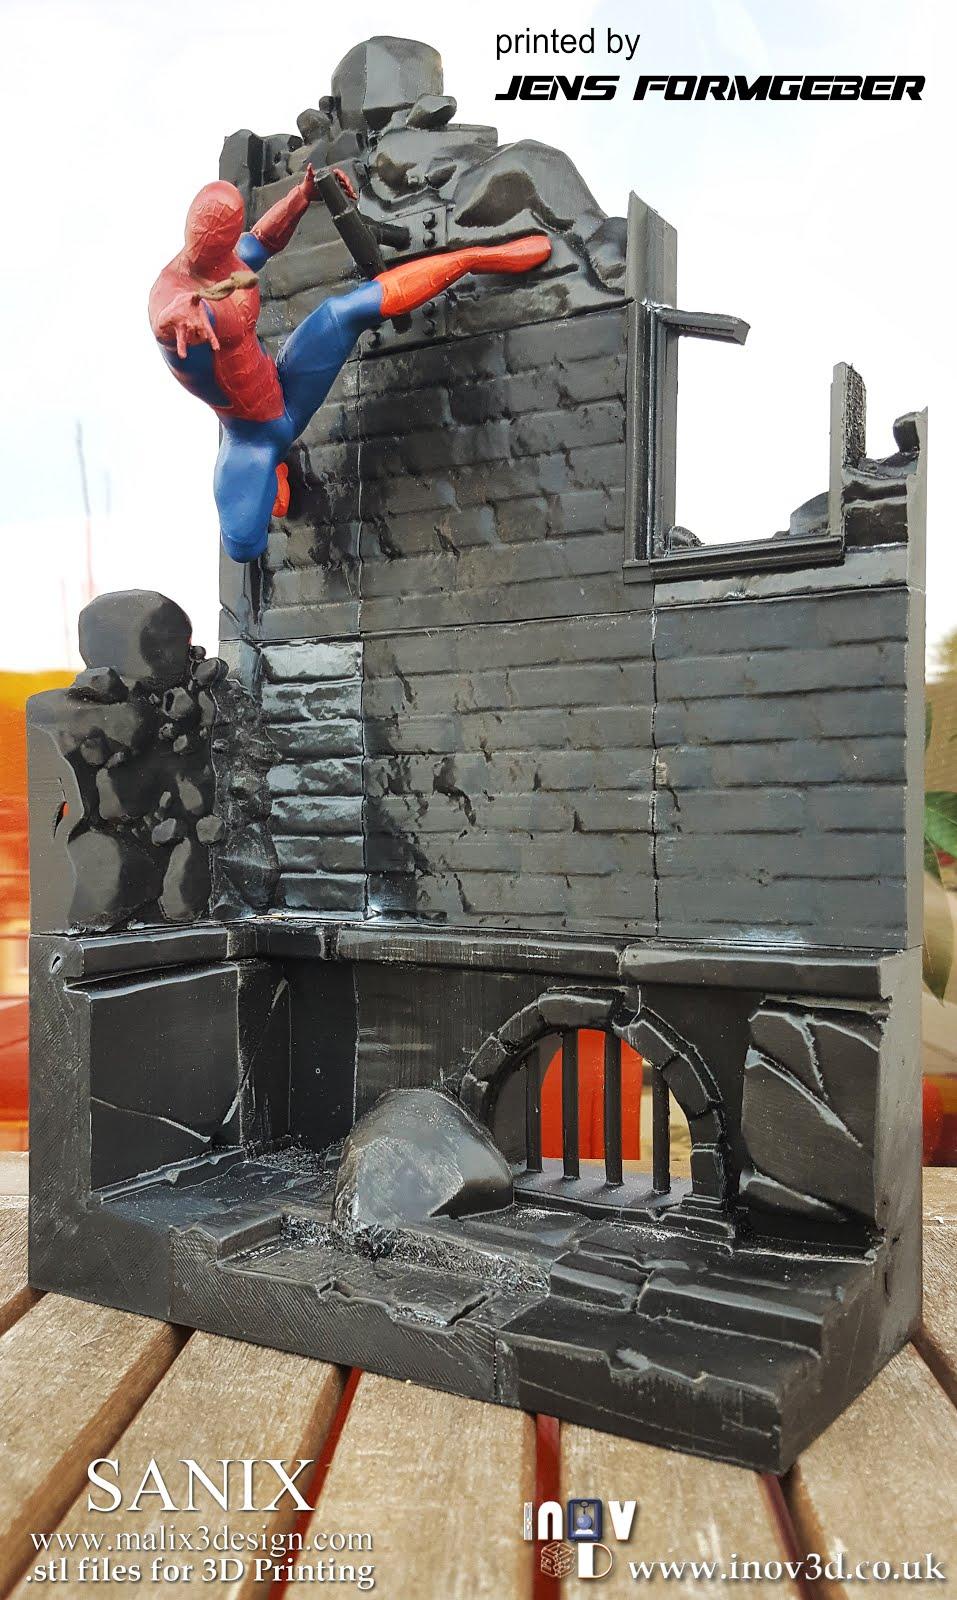 5e246db5a8 Full superheroes scene - Diorama for 3D printing. Five heroes ...